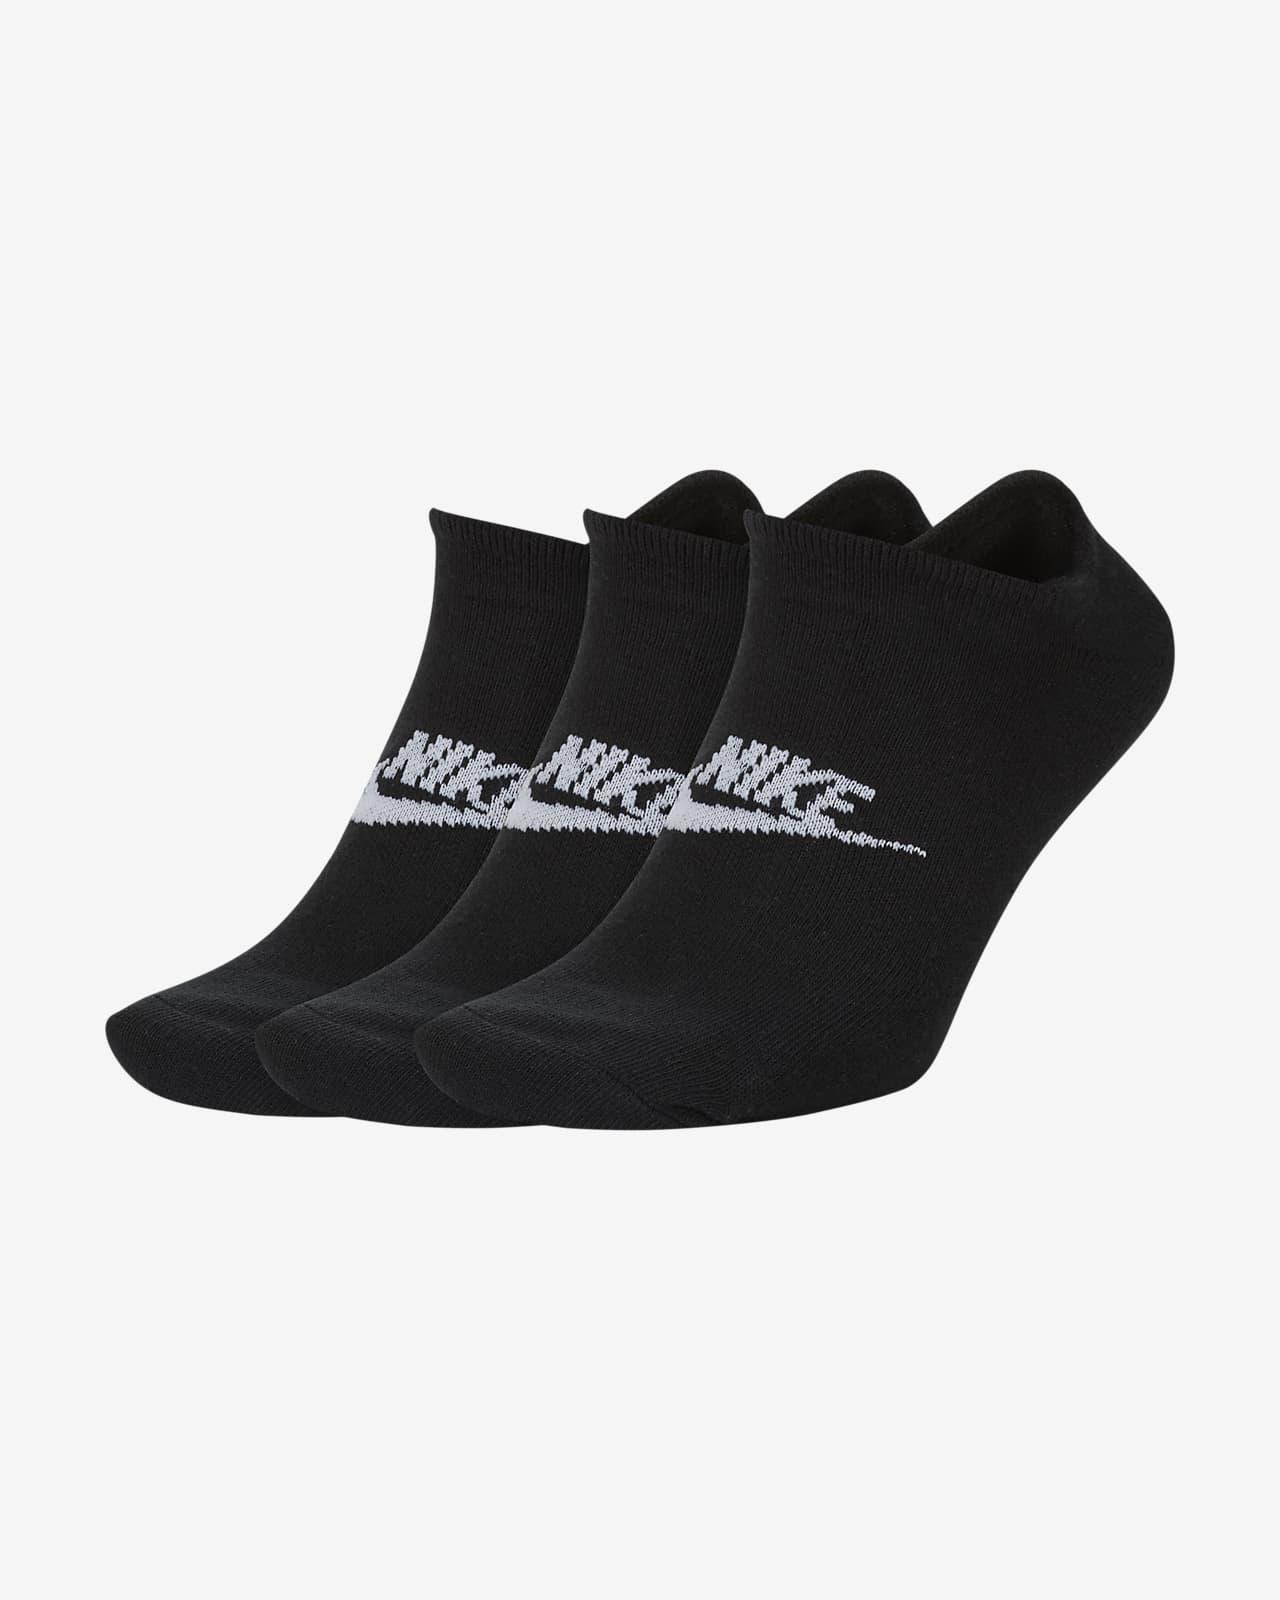 Nike Sportswear Everyday Essential No-Show Socks (3 Pairs)